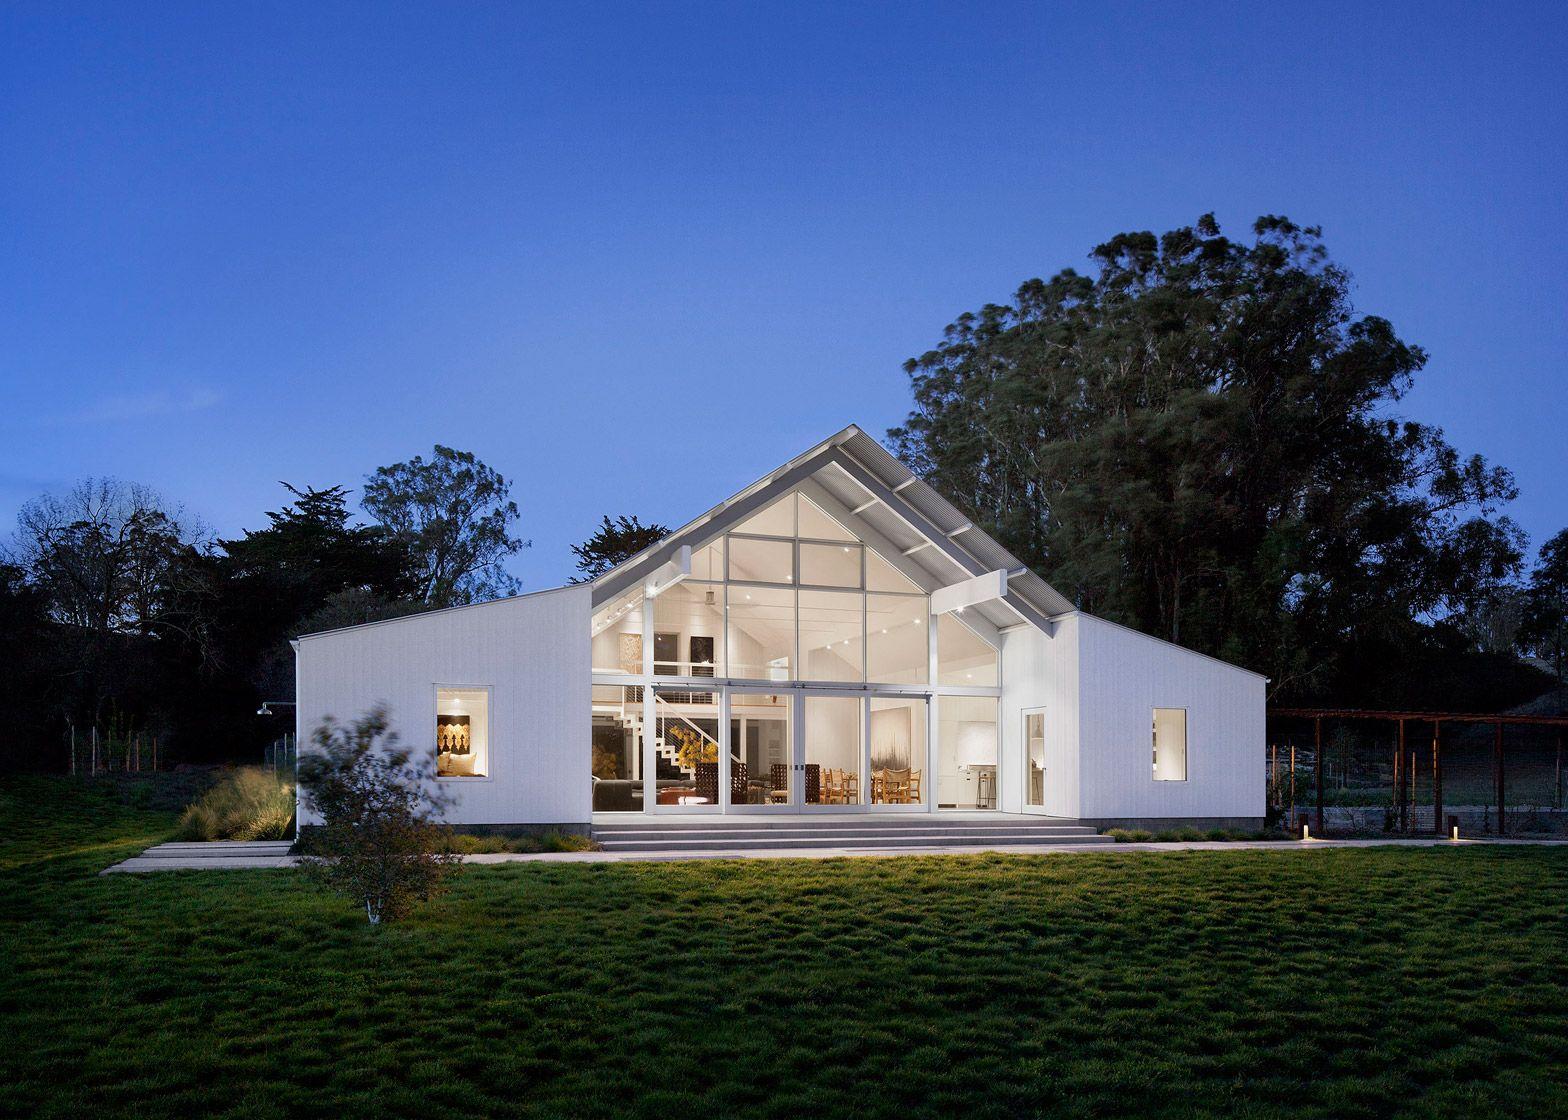 Turnbull Griffin Haesloop Creates White Barn Like House In California Barn Style House Barn House Design Modern Ranch